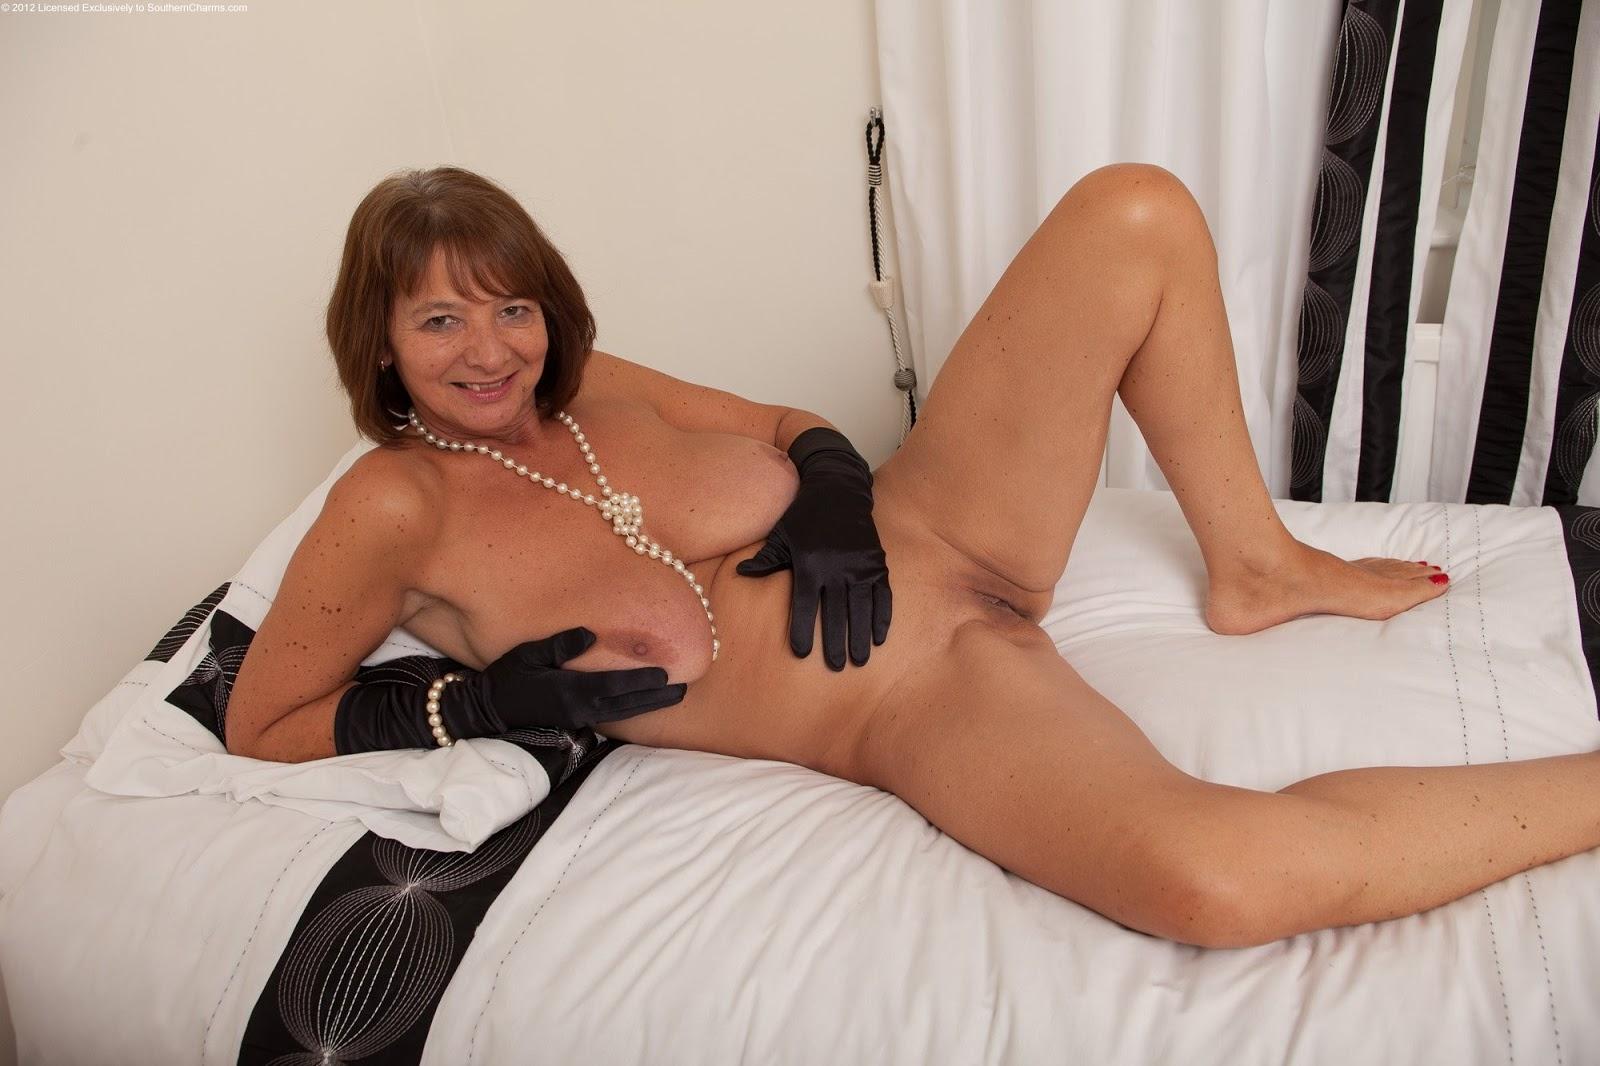 Mature Women Amature Porn